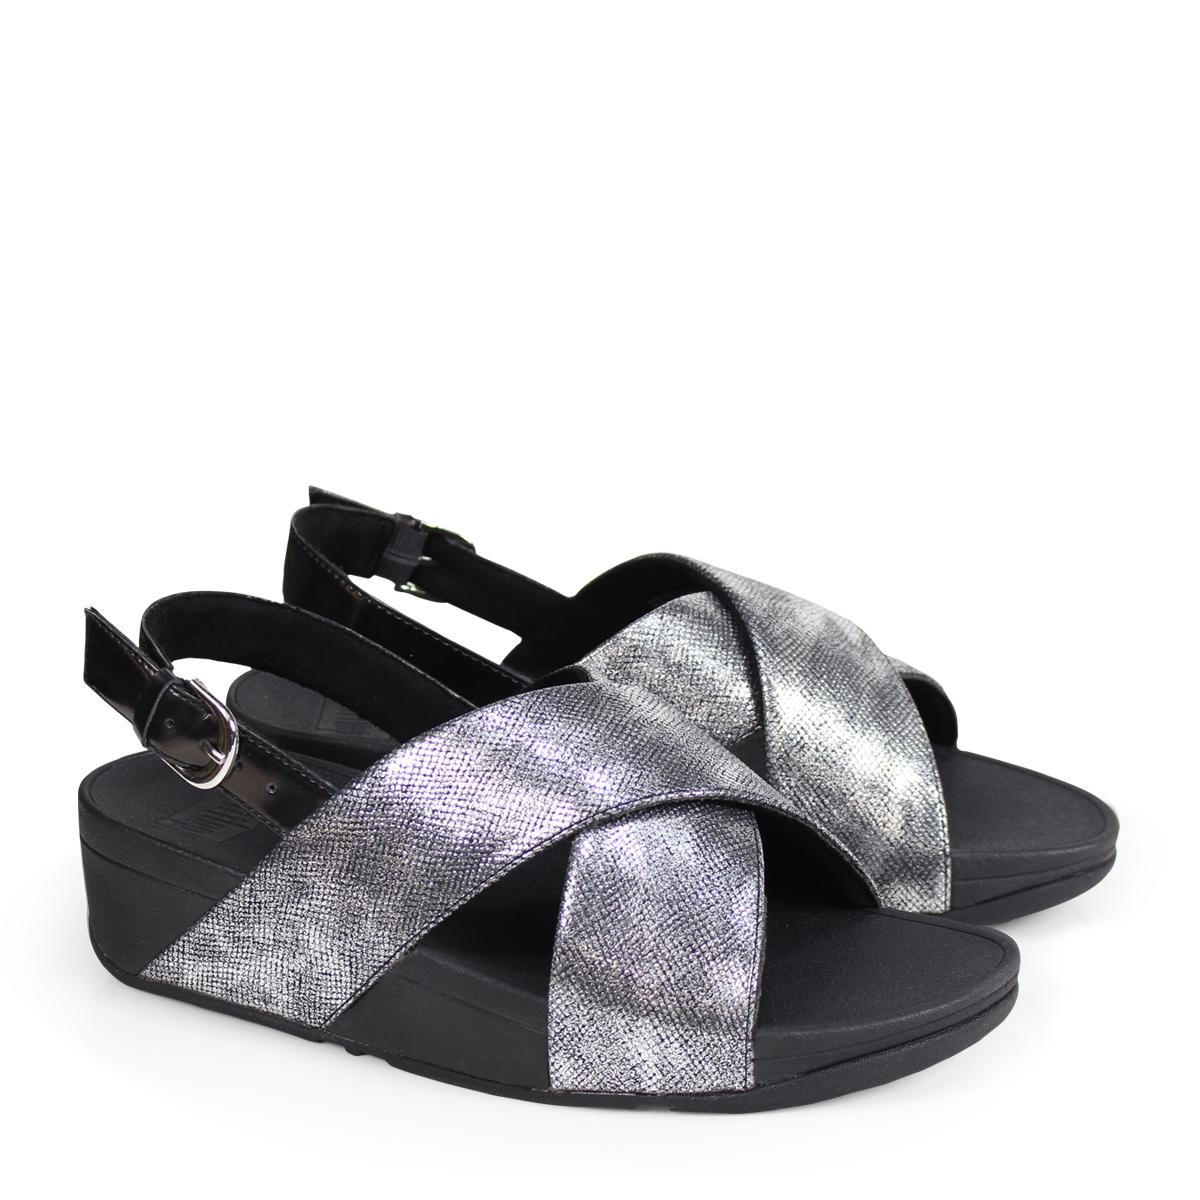 c89393aabfd1f6 FitFlop LULU CROSS BACK-STRAP SANDALS SHIMMER-PRINT sandals fitting FLOP  Lulu Lady s K54 black  4 4 Shinnyu load   184